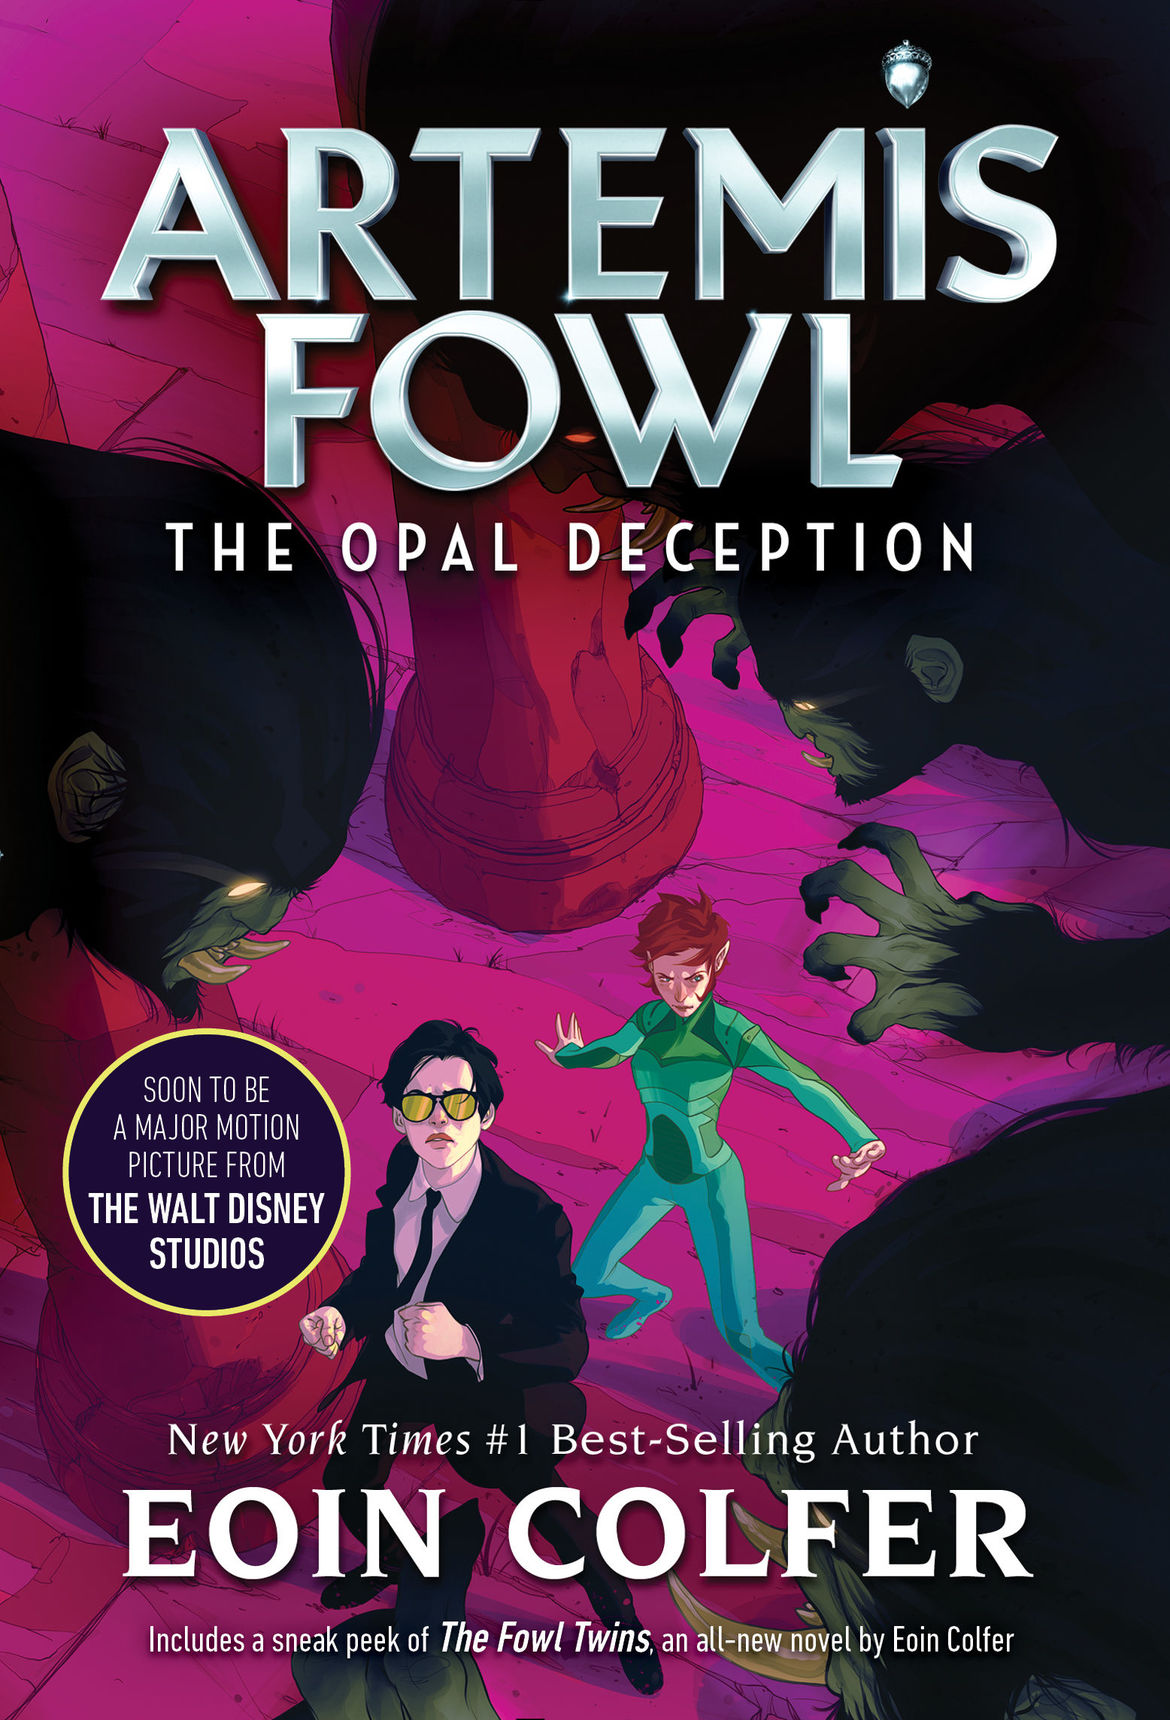 Artemis Fowl 4 The Opal Deception repackage